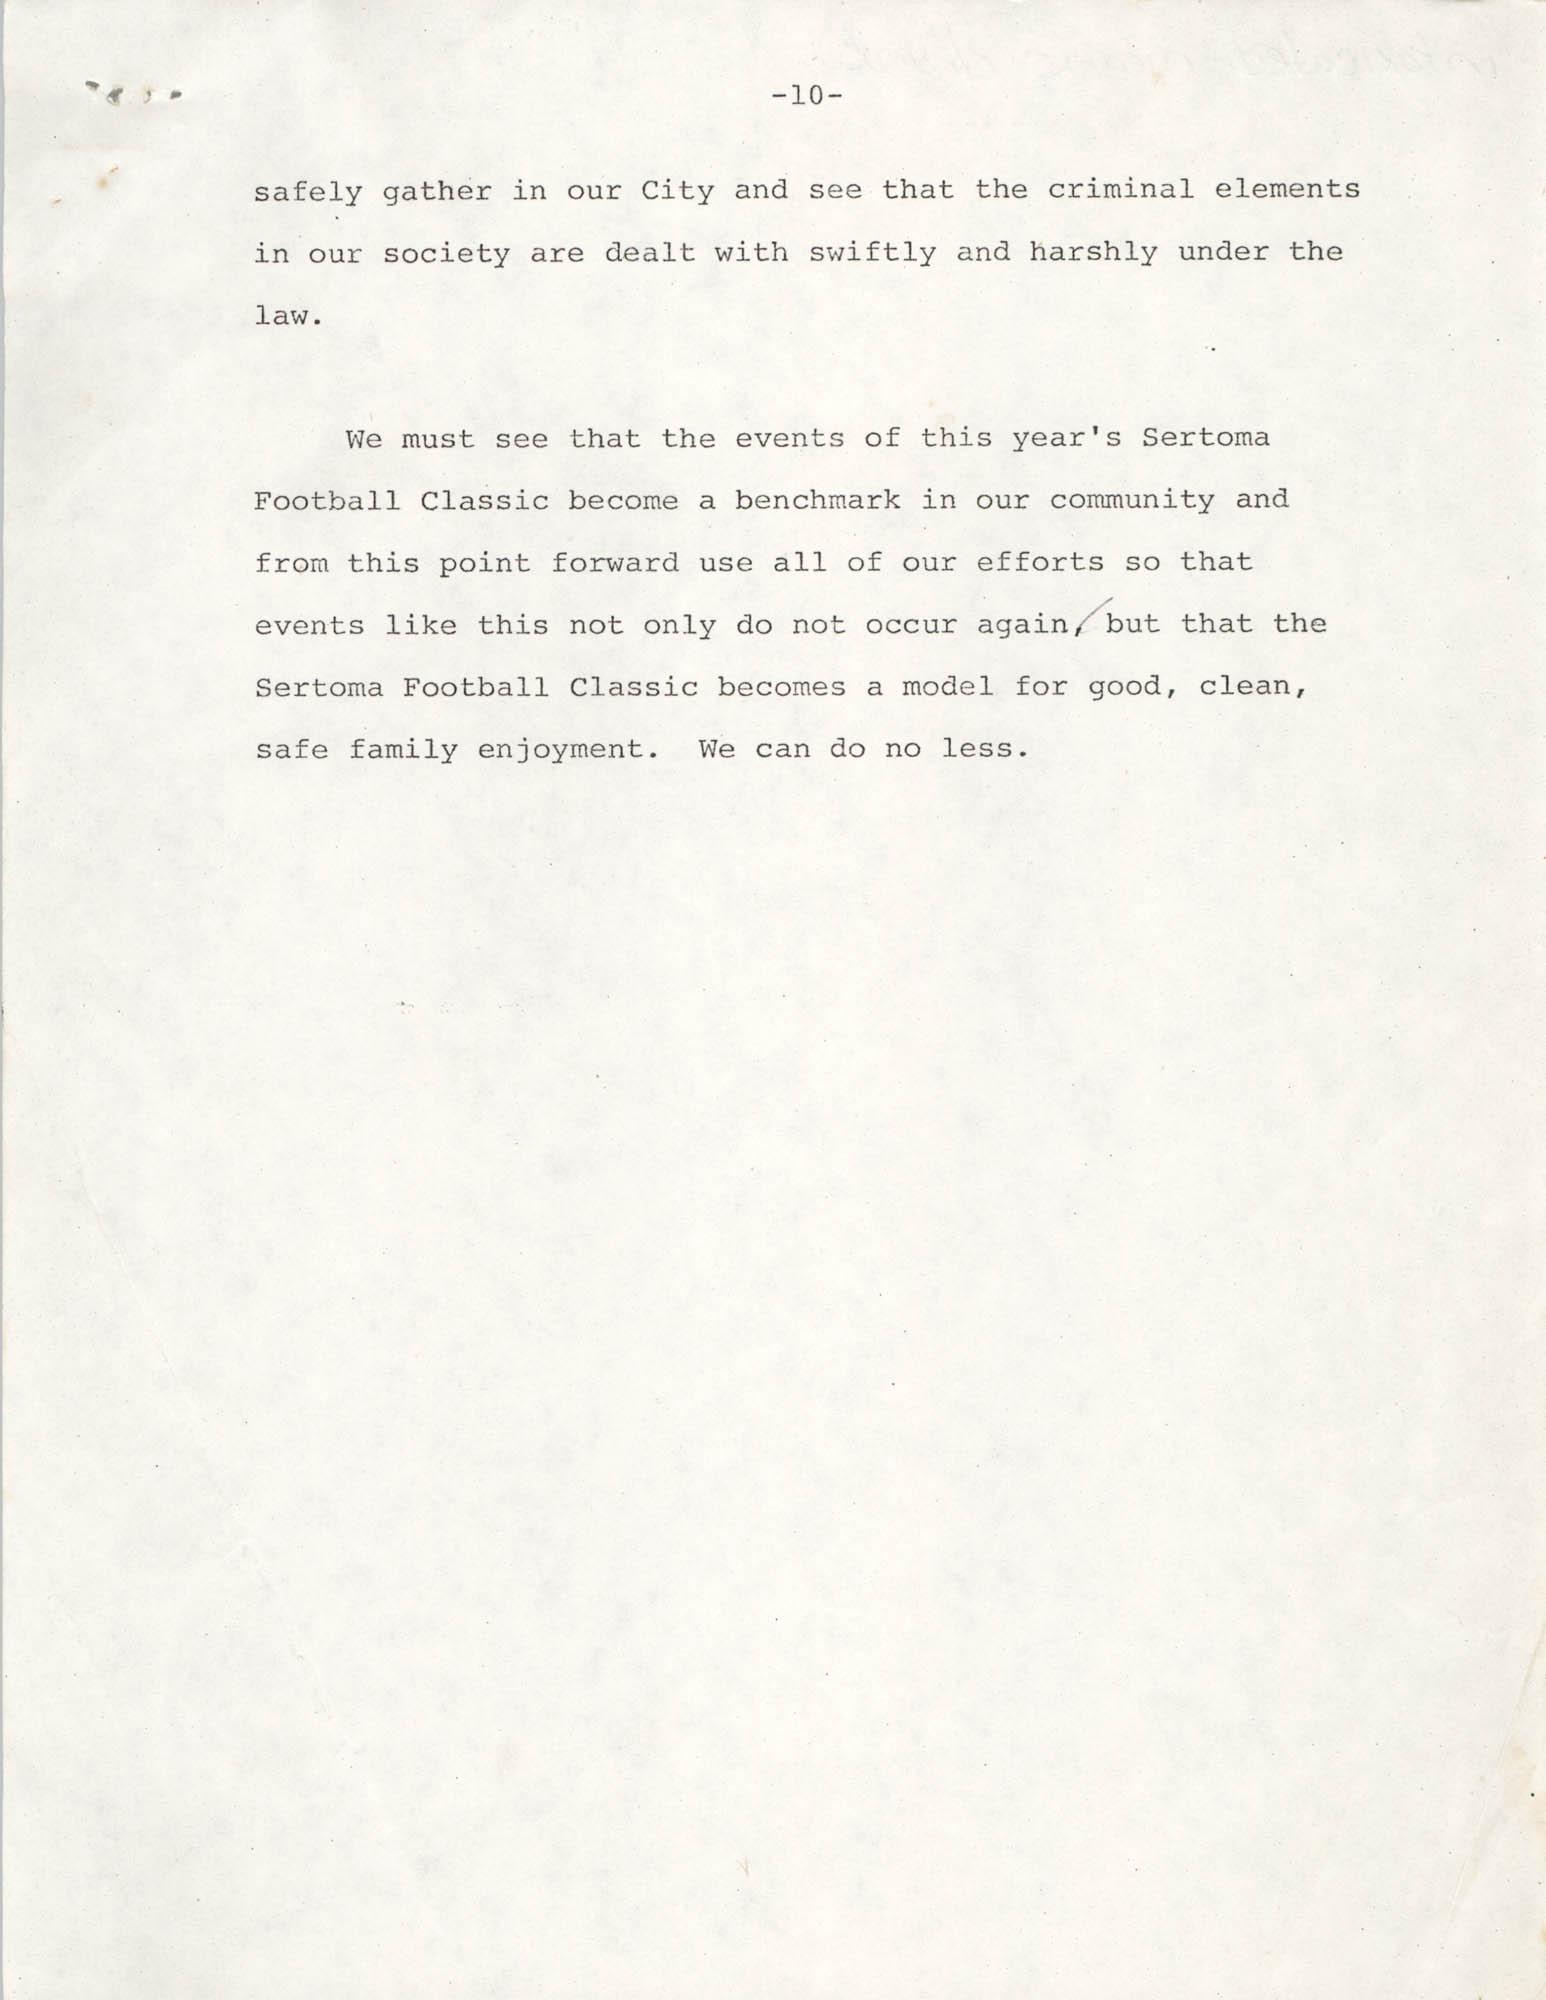 Typescript Speech on the Sertoma Football Classic, Page 10